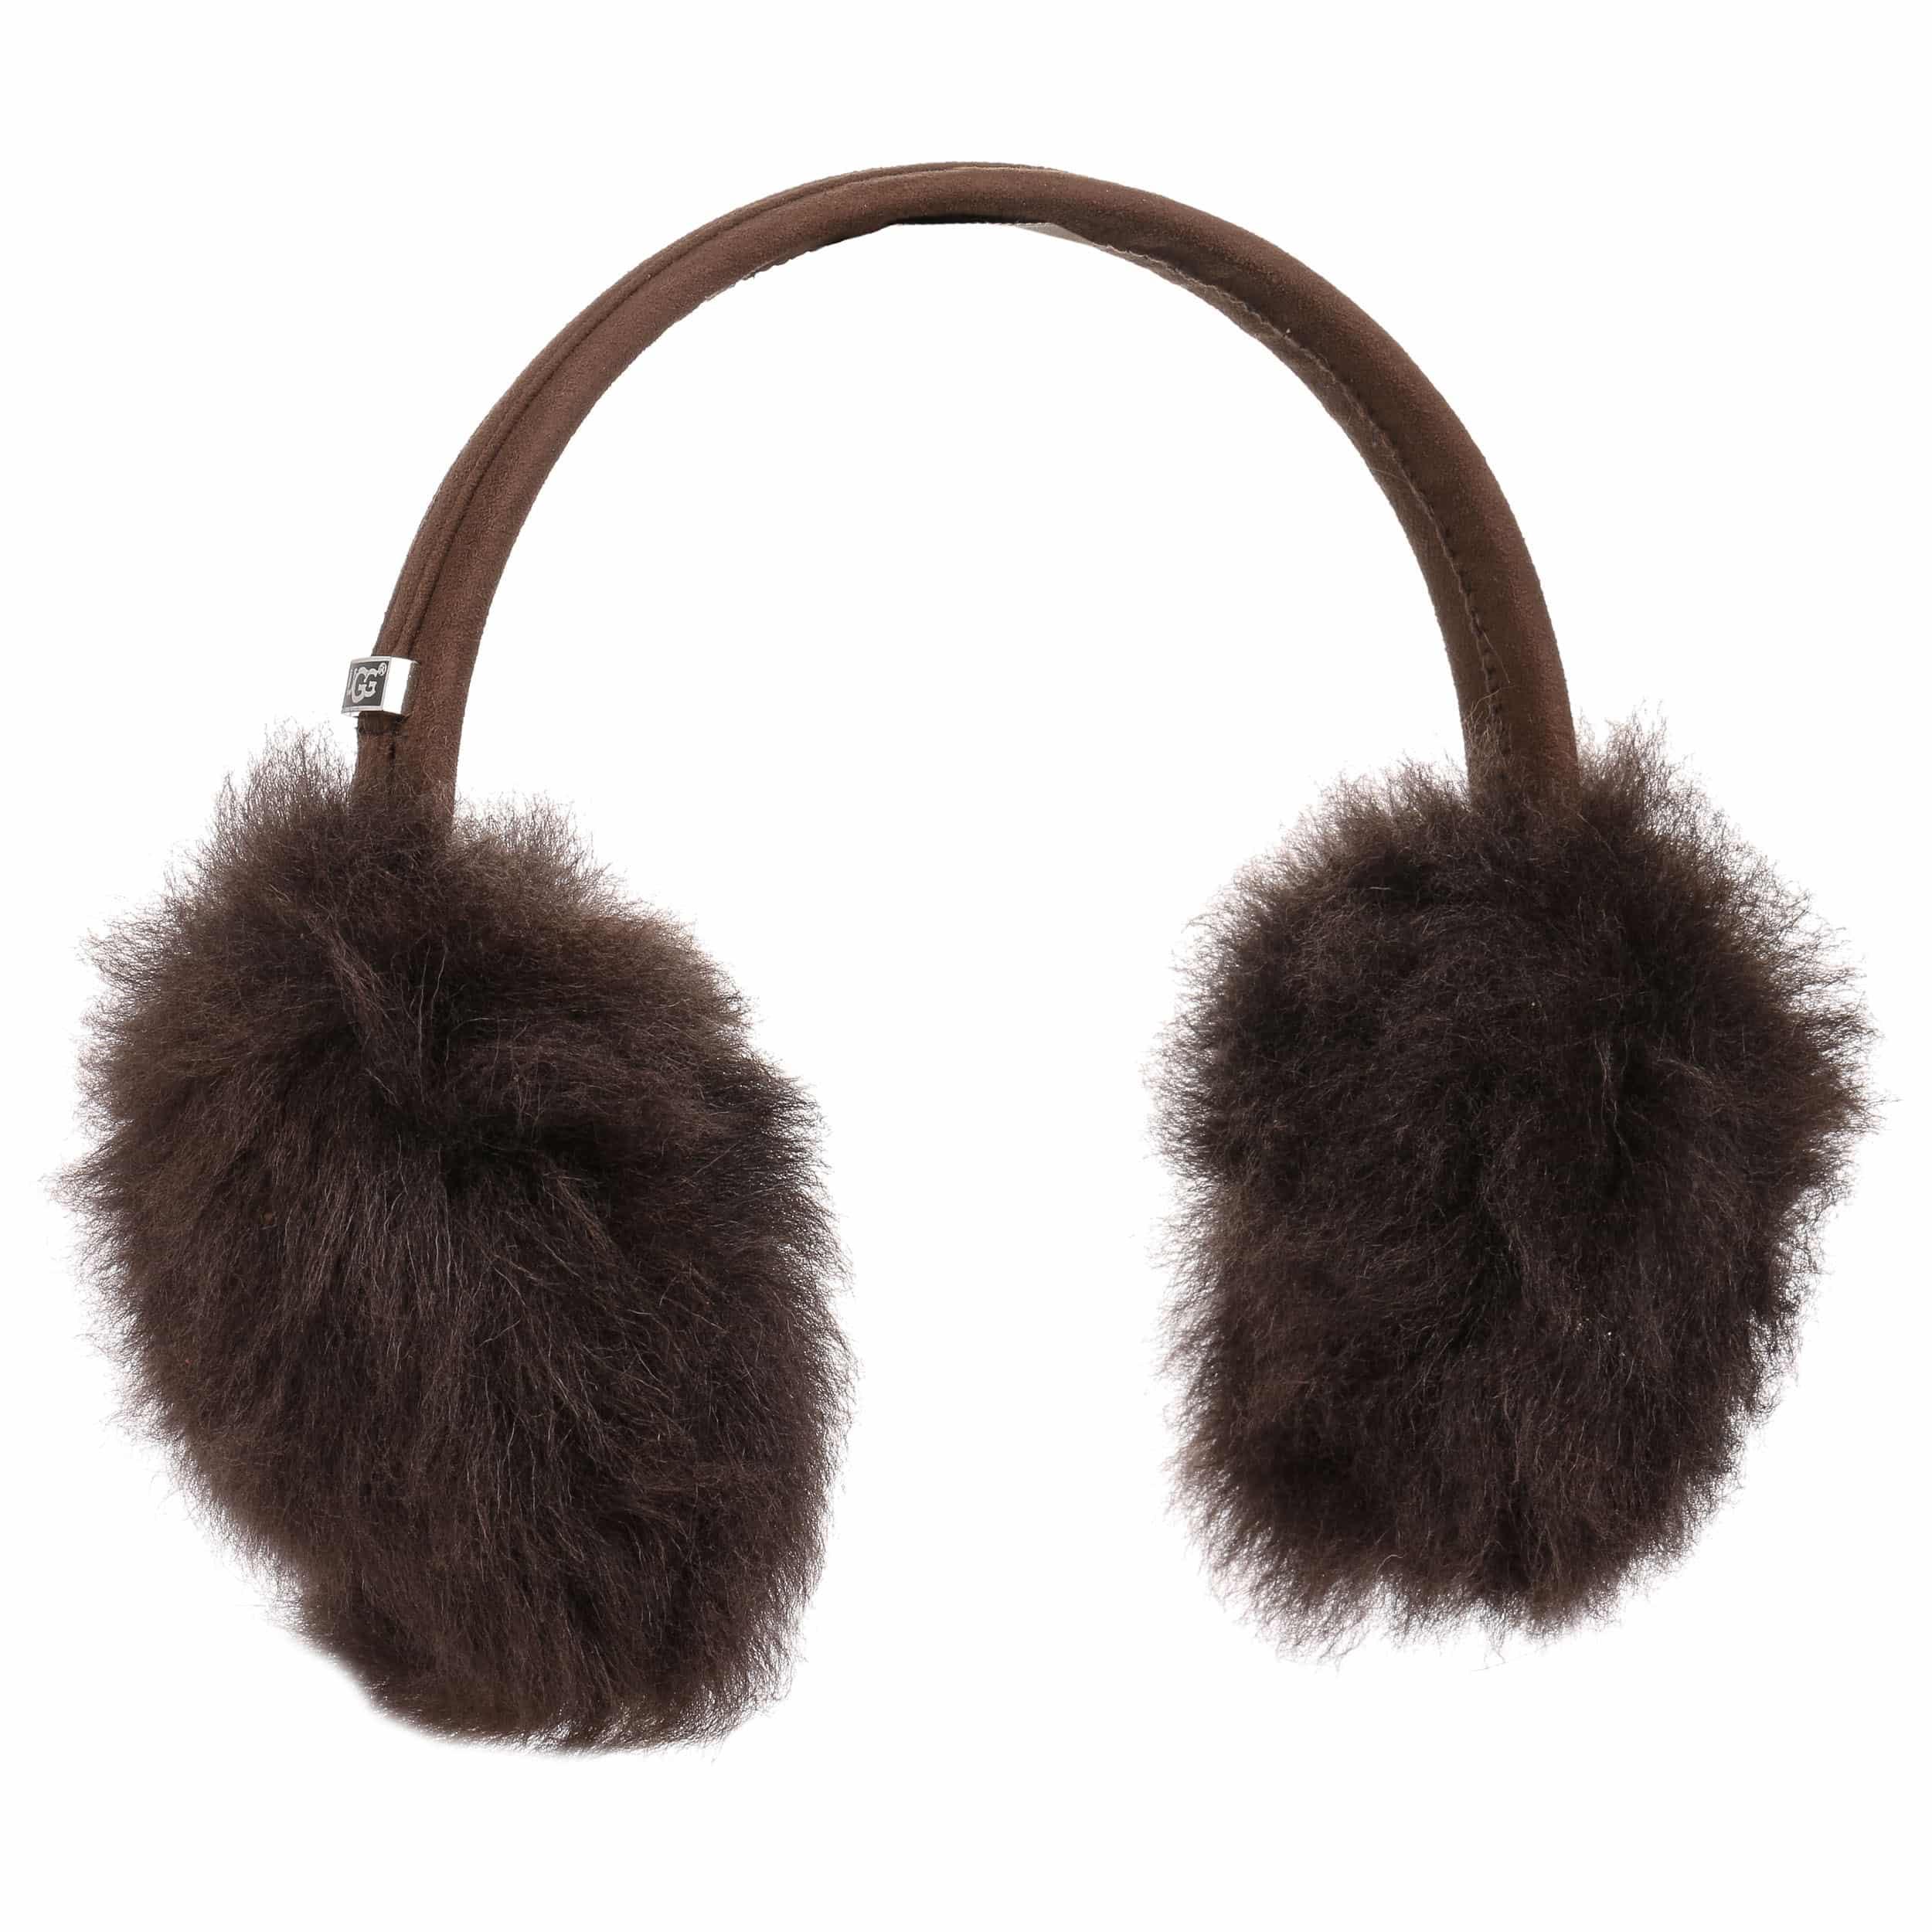 26ee5fe72cc Wired Sheepskin Earmuffs by UGG